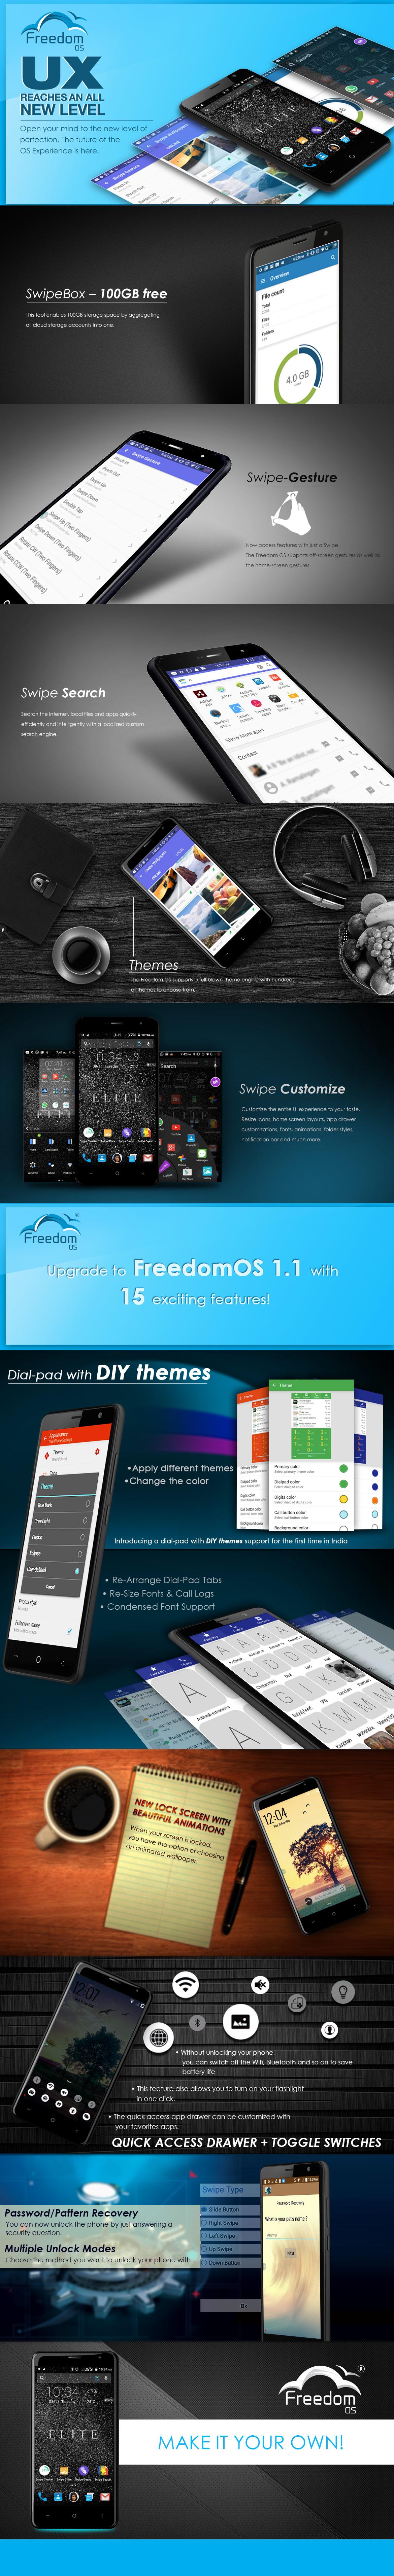 freedom-app-webpage